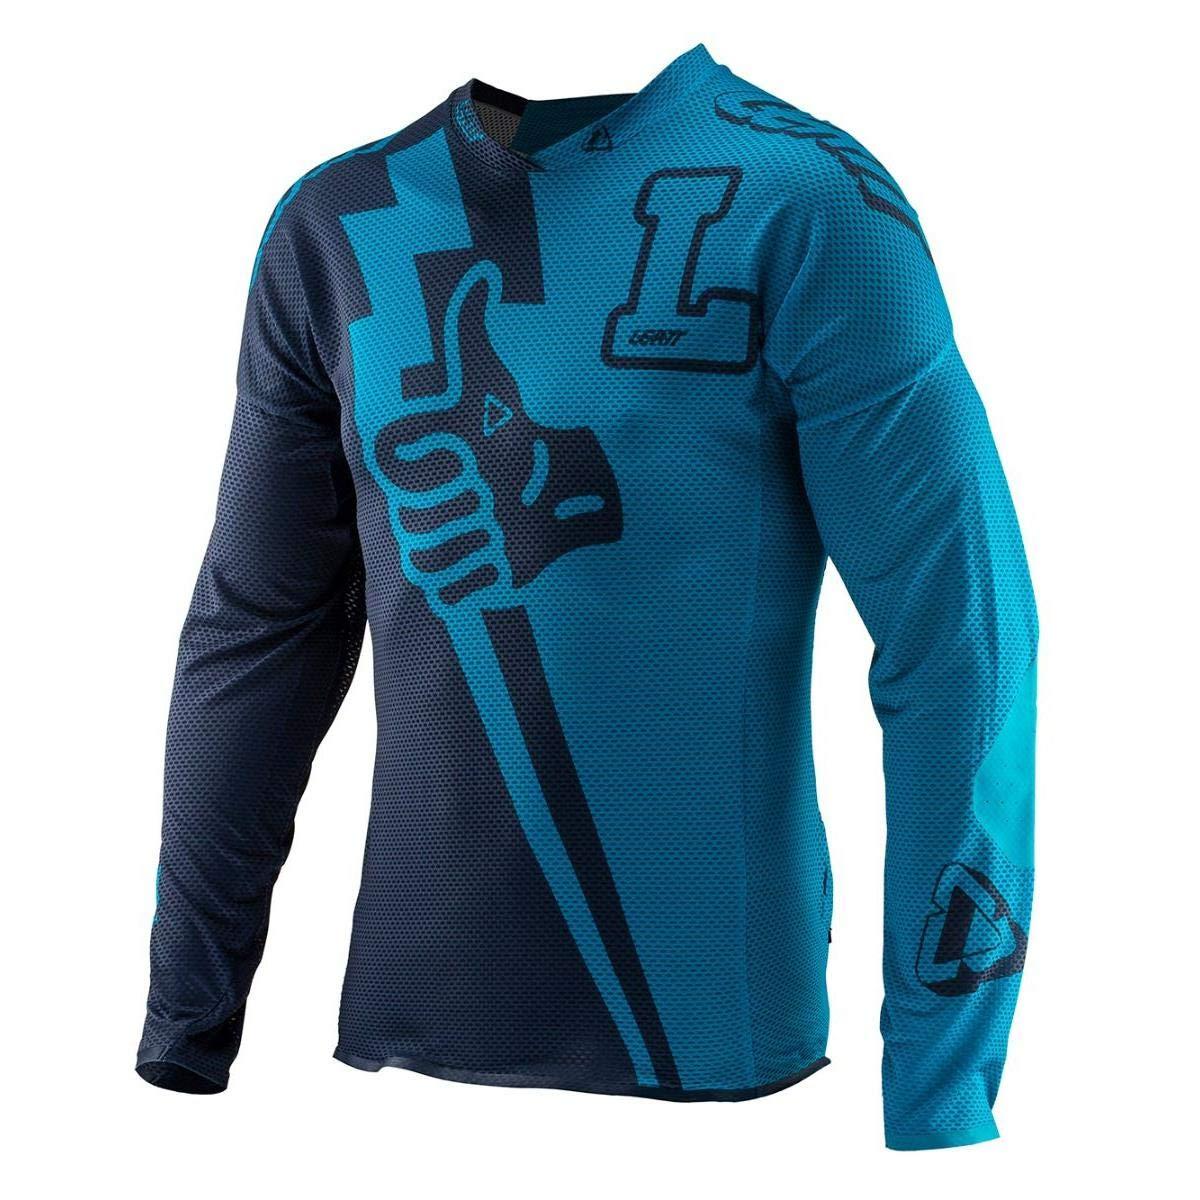 Leatt Downhill-Jersey DBX 4.0 Ultraweld Blau Gr. XL